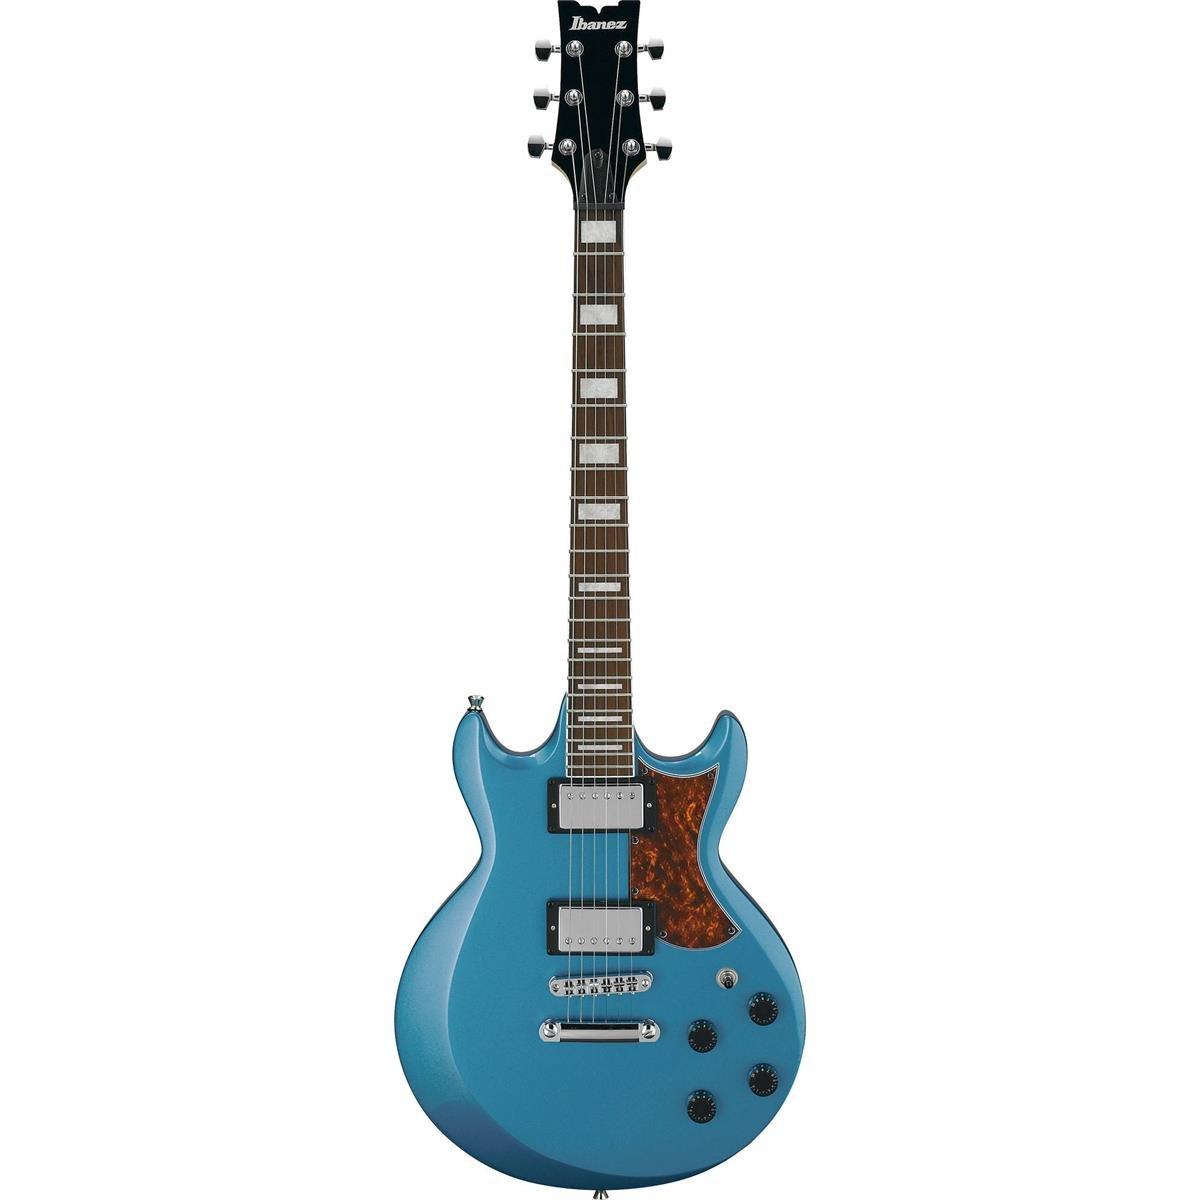 Ibanez AX120MLB Electric - Metallic Light Blue